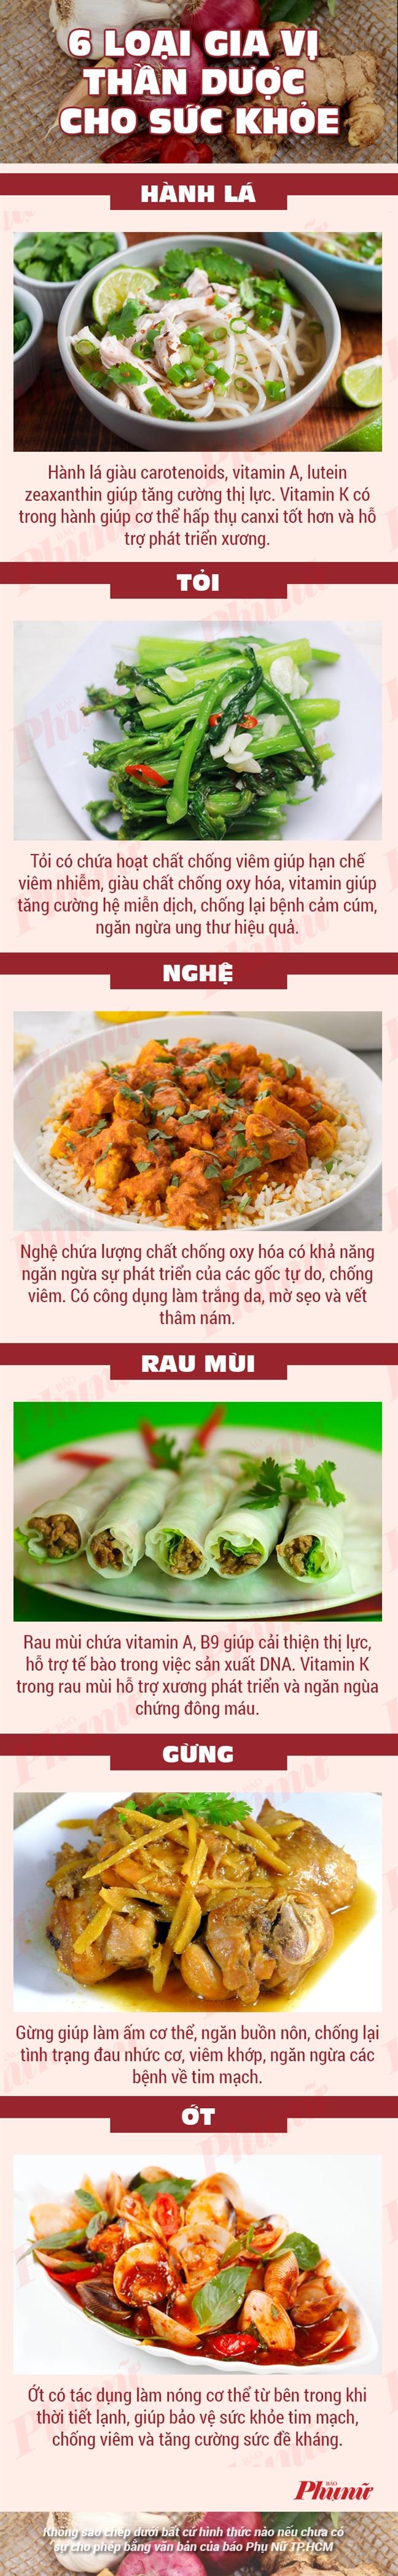 6 loai gia vi Viet Nam kho nuot nhung la than duoc cho suc khoe